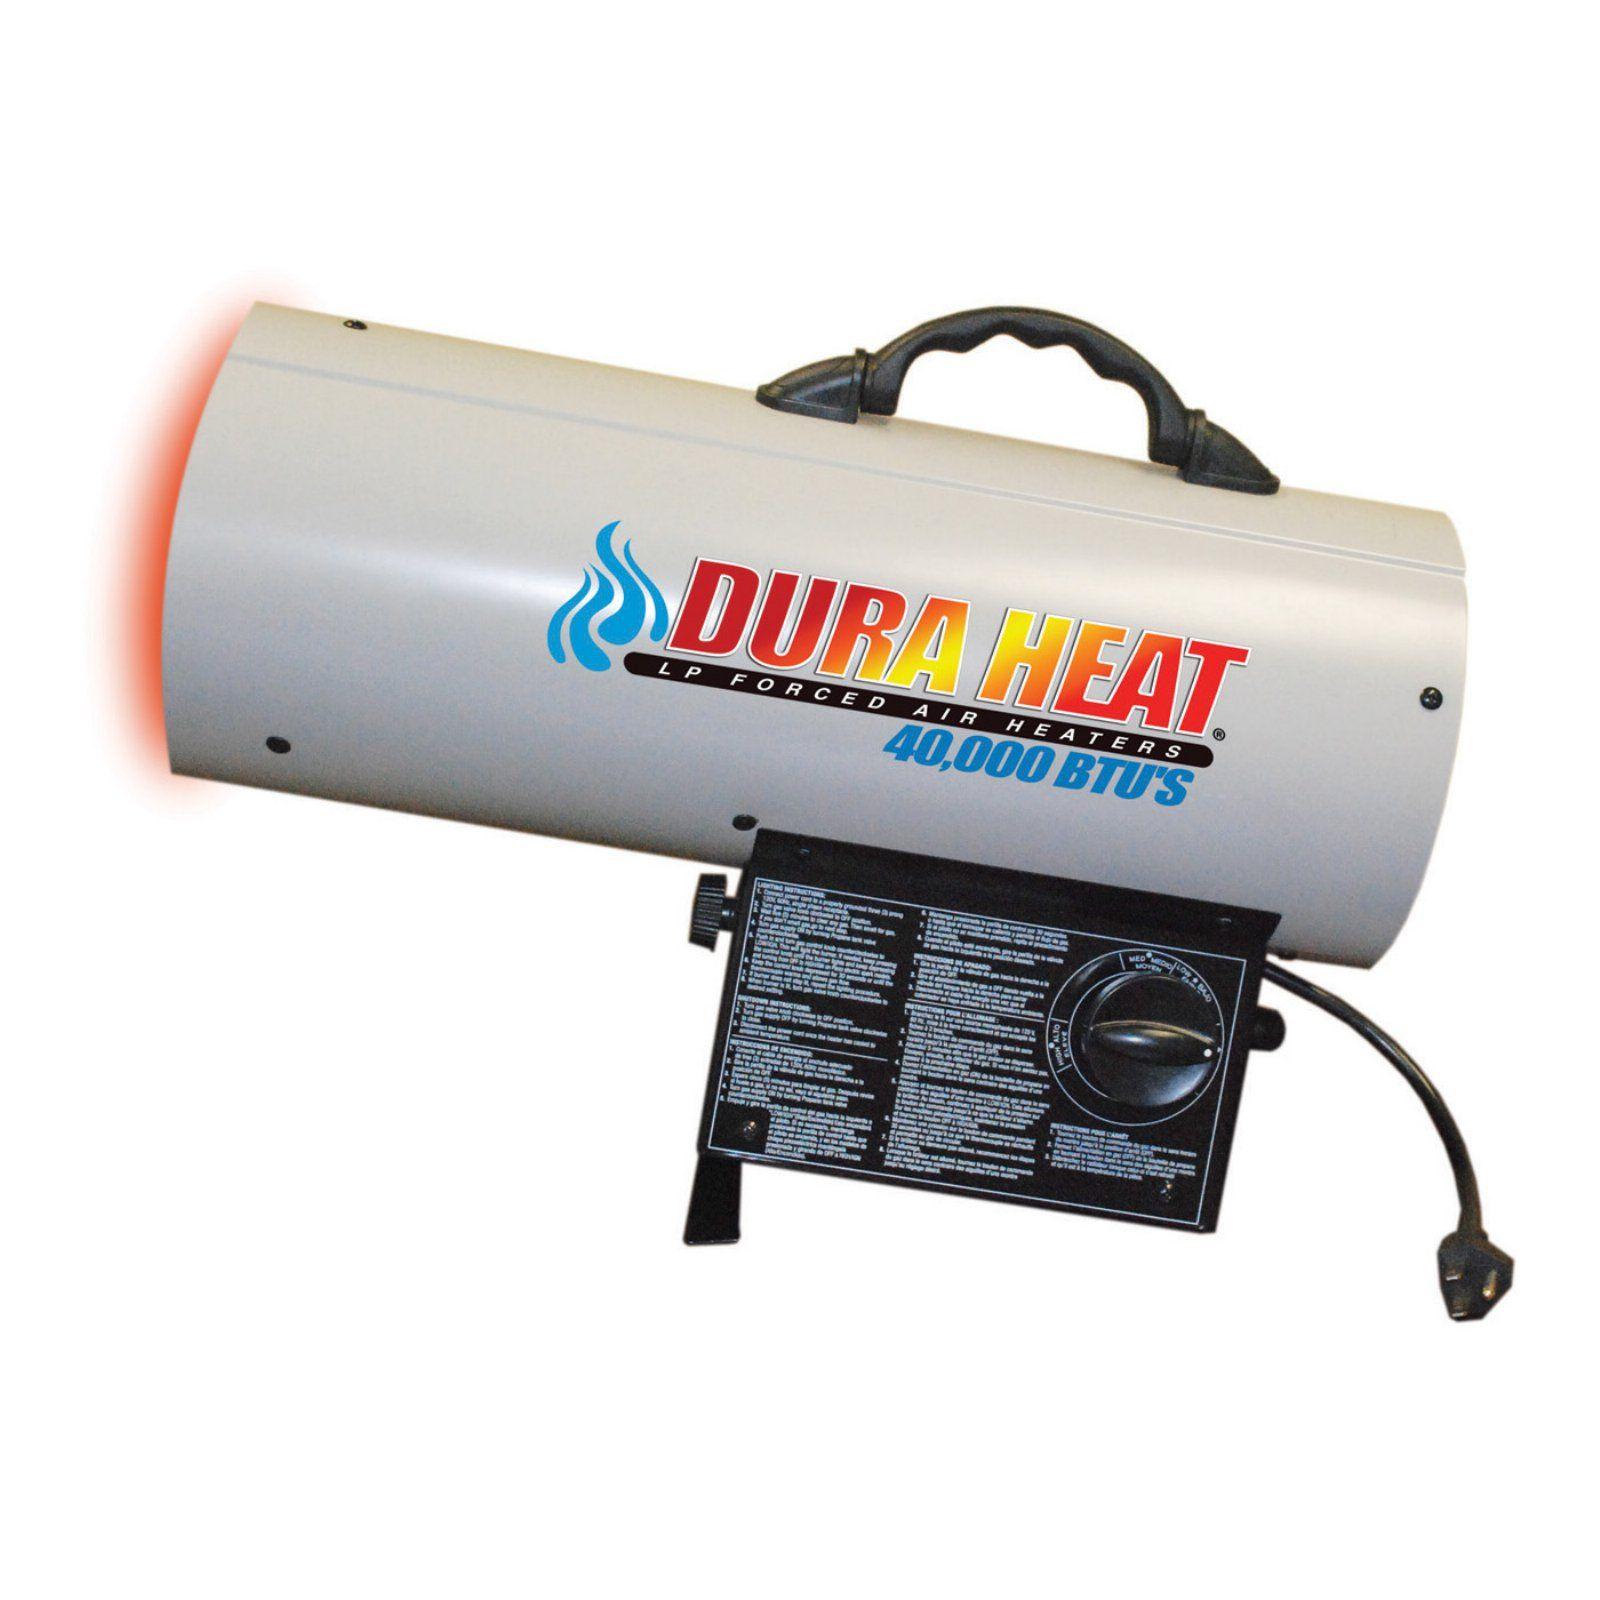 Dura Heat GFA40 Propane Forced Air Utility Heater